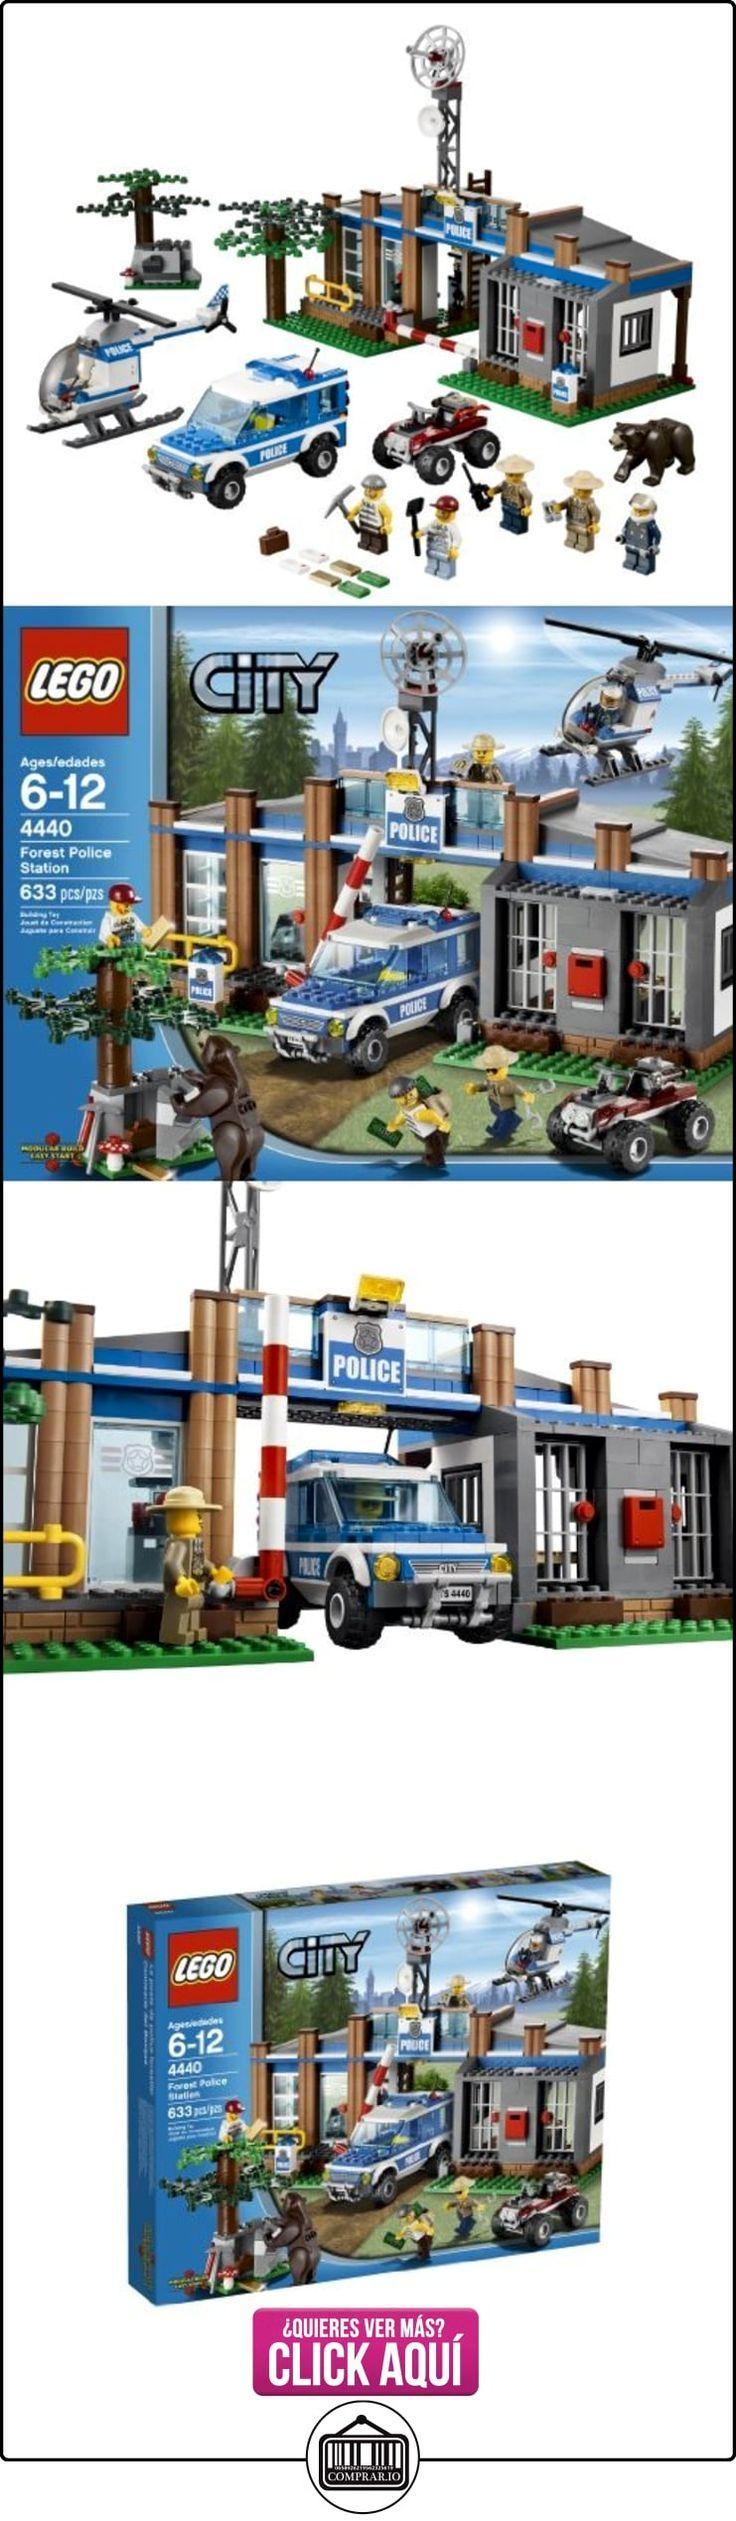 LEGO City Police Forest Station 4440 by LEGO ✿ Lego - el surtido más amplio ✿ ▬► Ver oferta: https://comprar.io/goto/B005VPRDKE